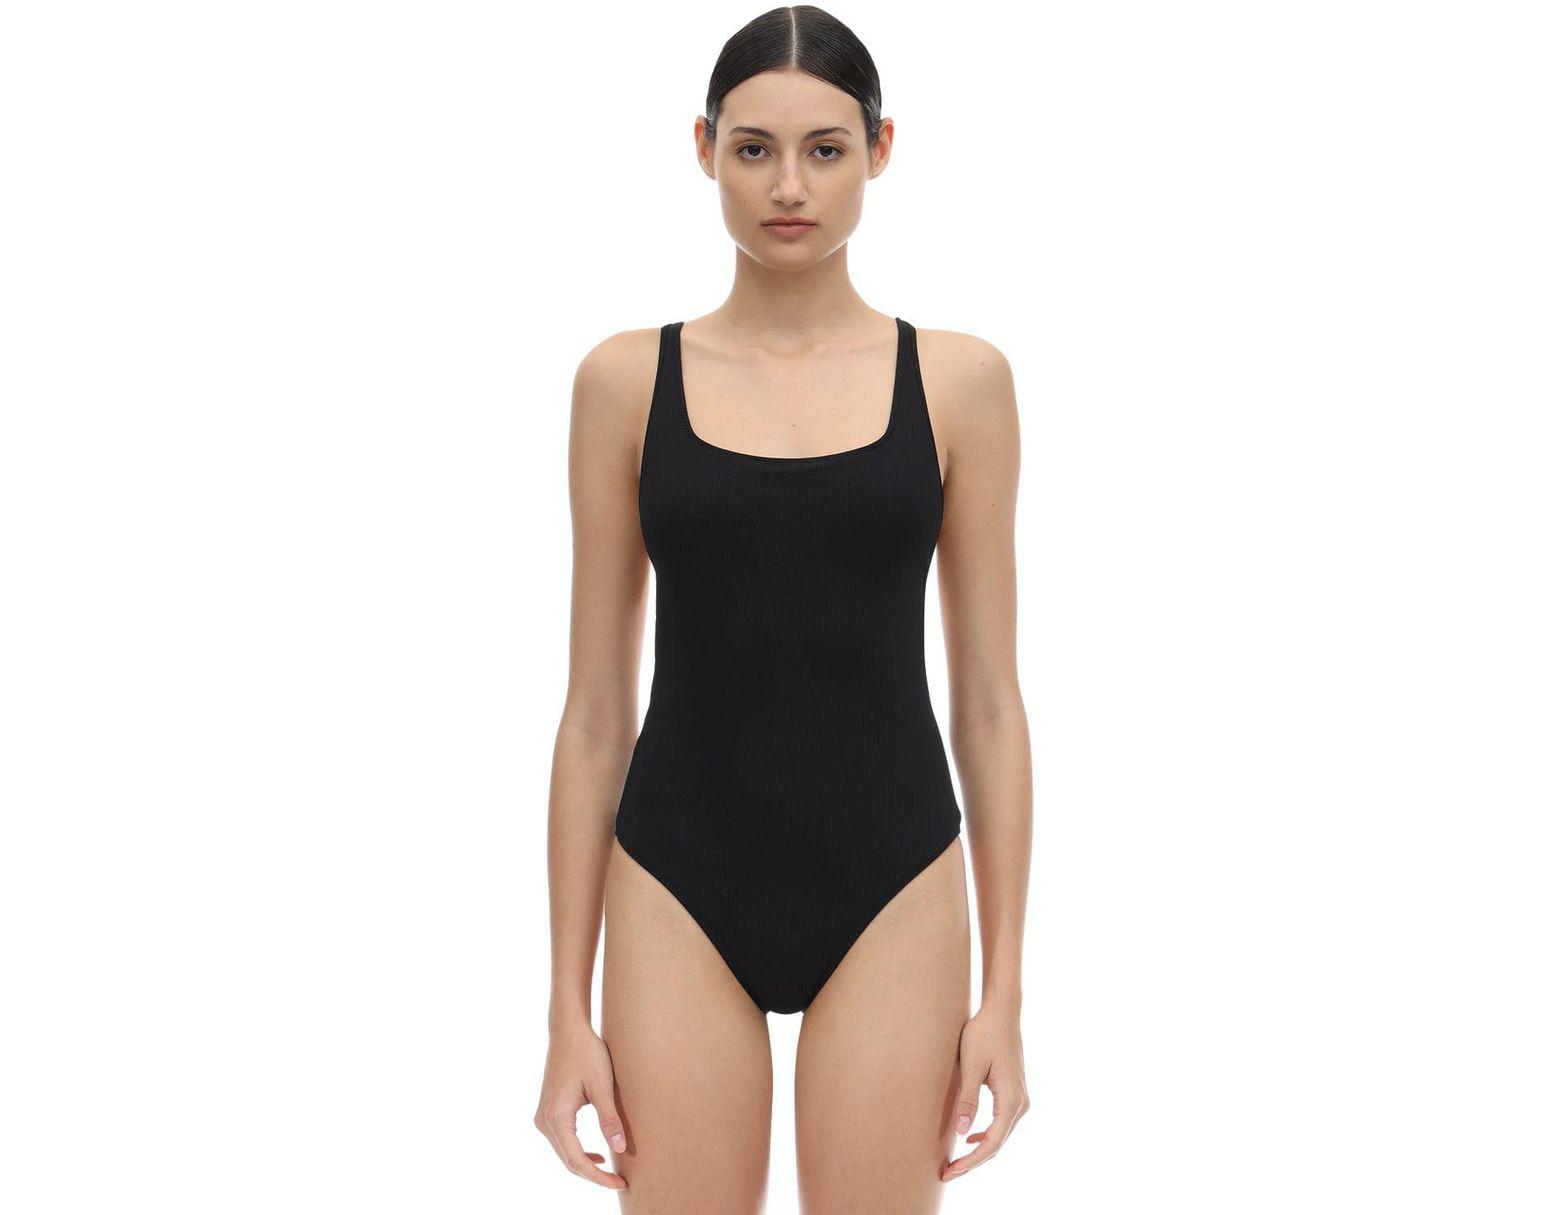 f818587e27de7 Ganni Back Crossed Textured One Piece Swimsuit in Black - Lyst